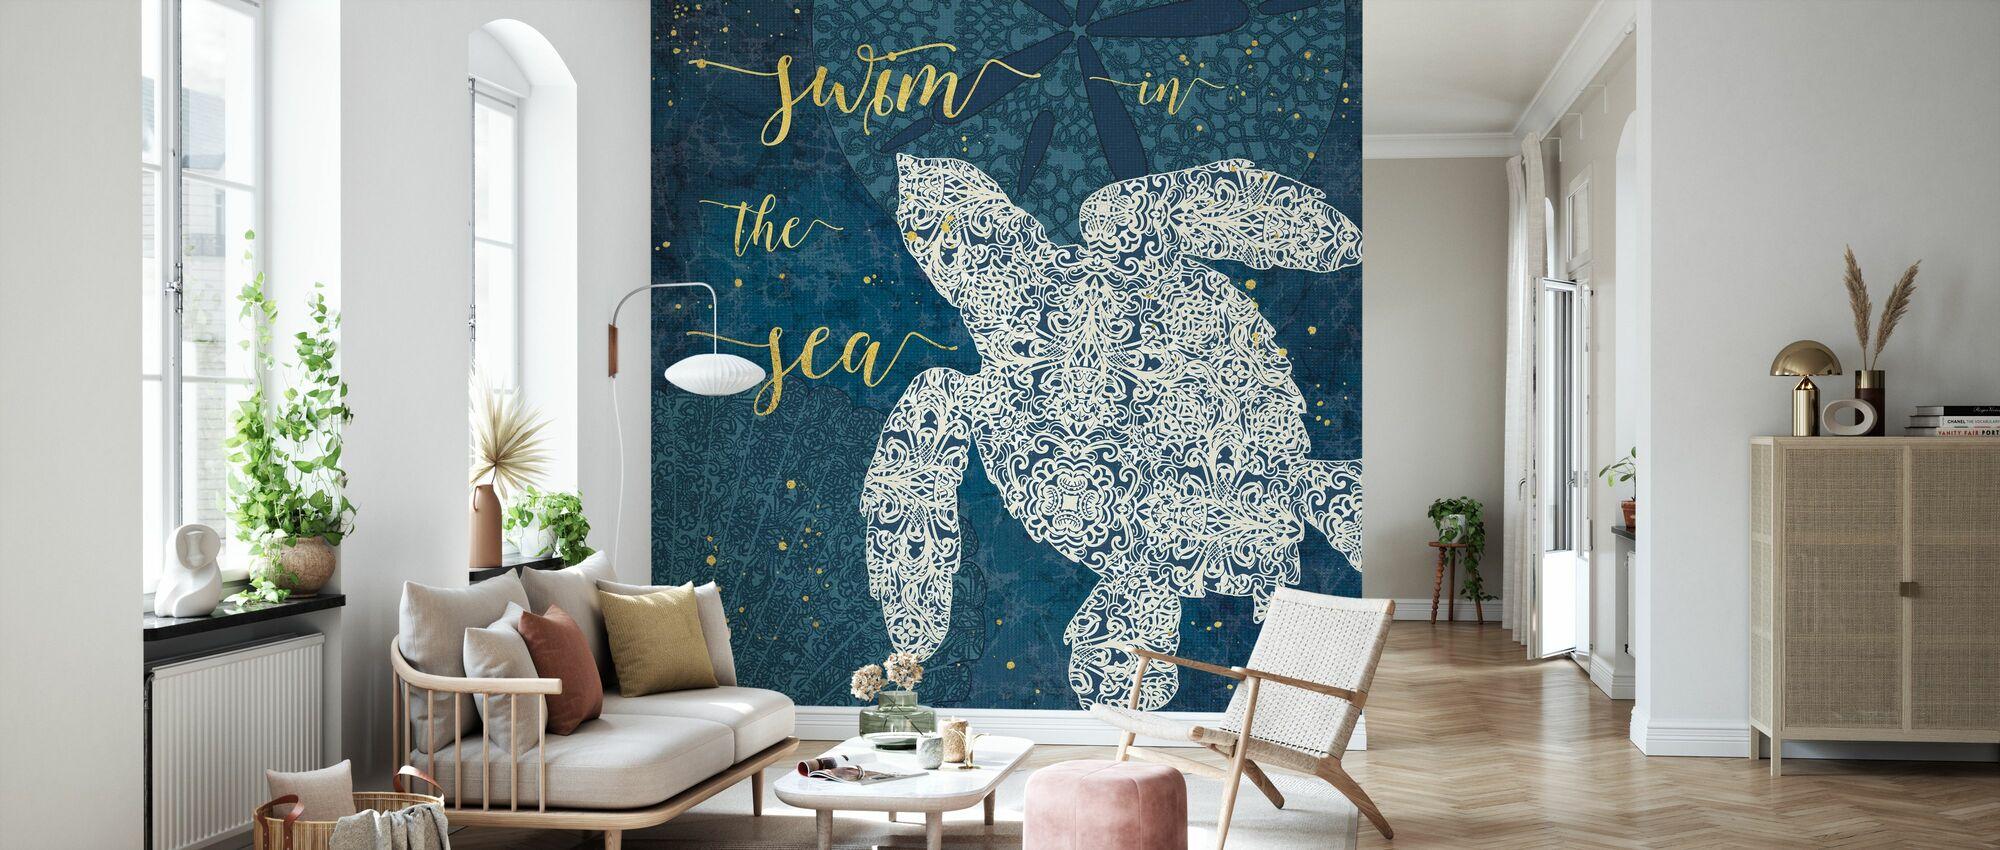 Swim in the Sea - Wallpaper - Living Room